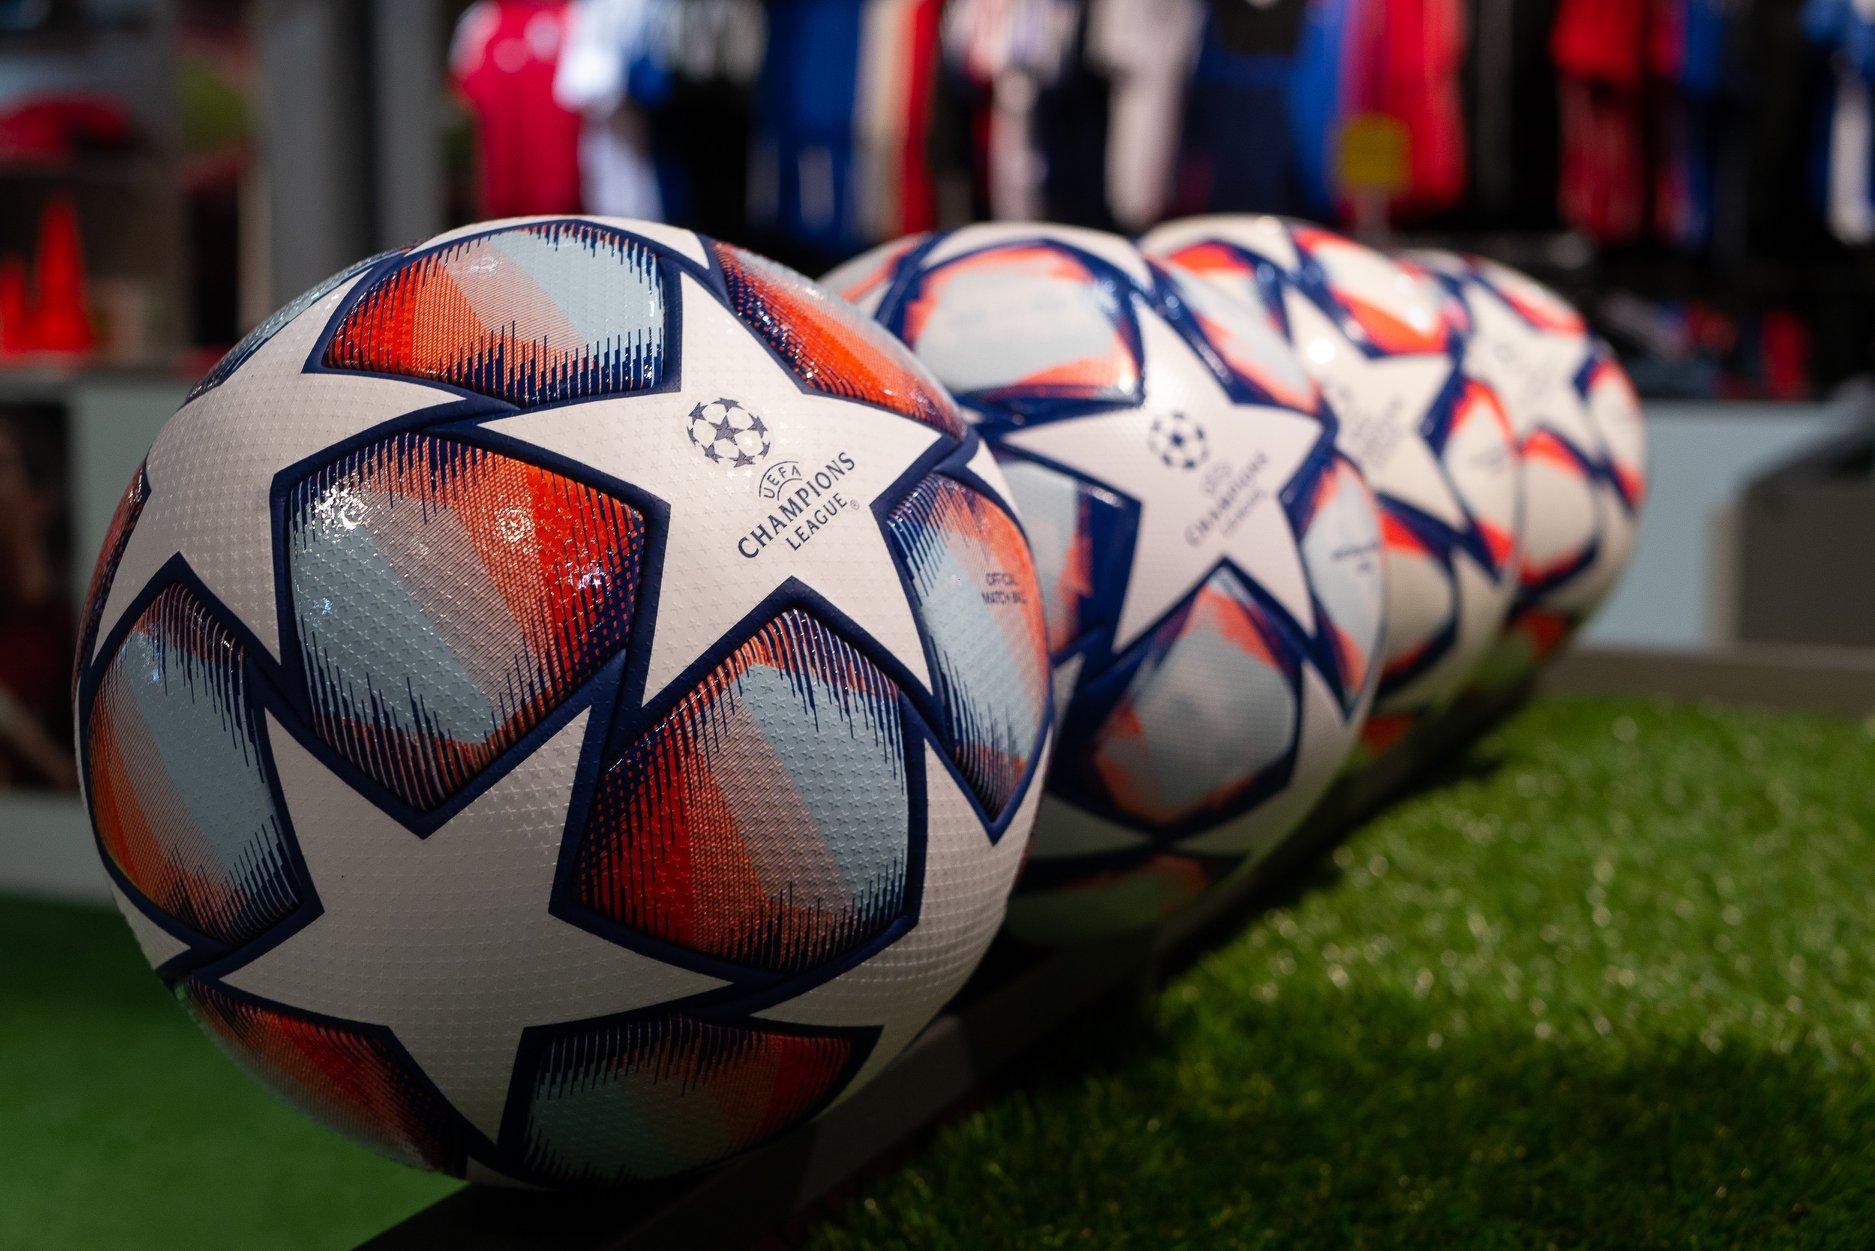 Quả bóng Adidas Champions League 20/21 Match Ball